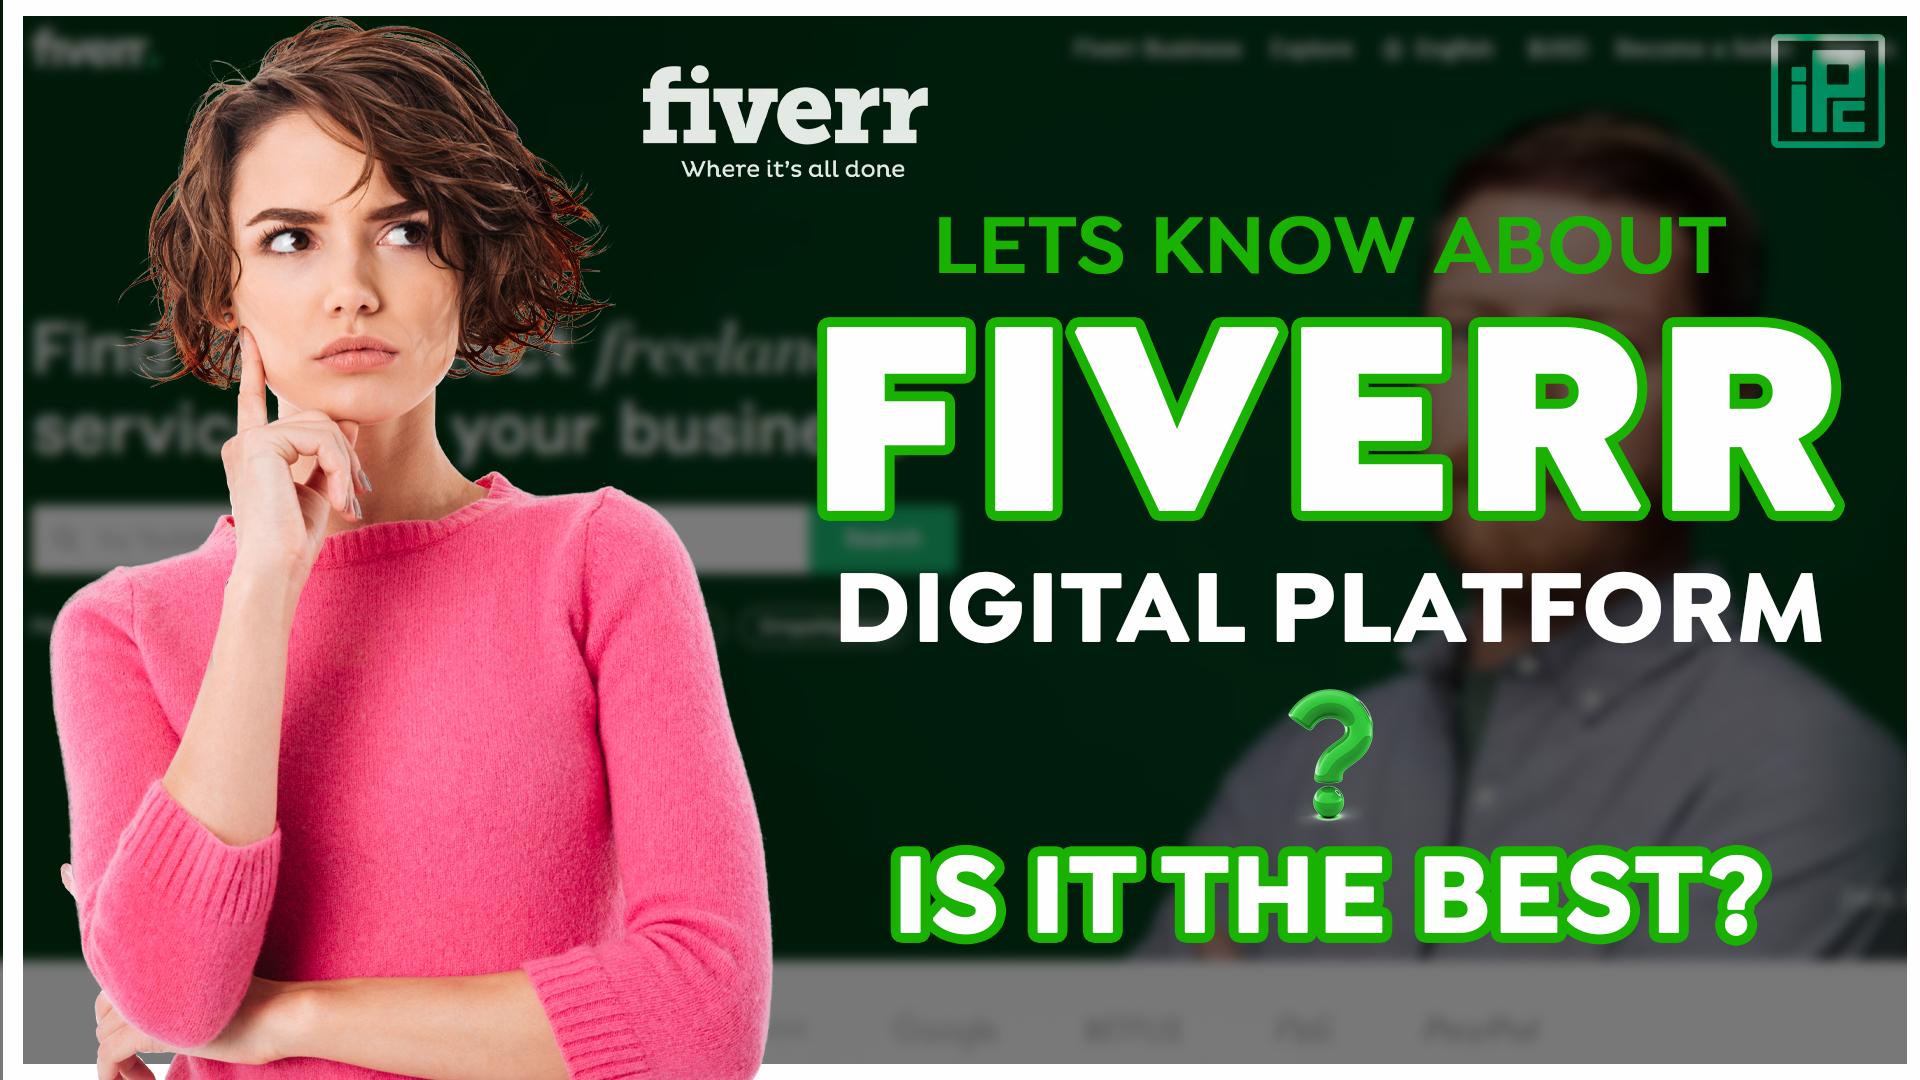 fiver, what is fiverr, how fiverr work, let's talk about fiverr, fiverr for design, fiverr website